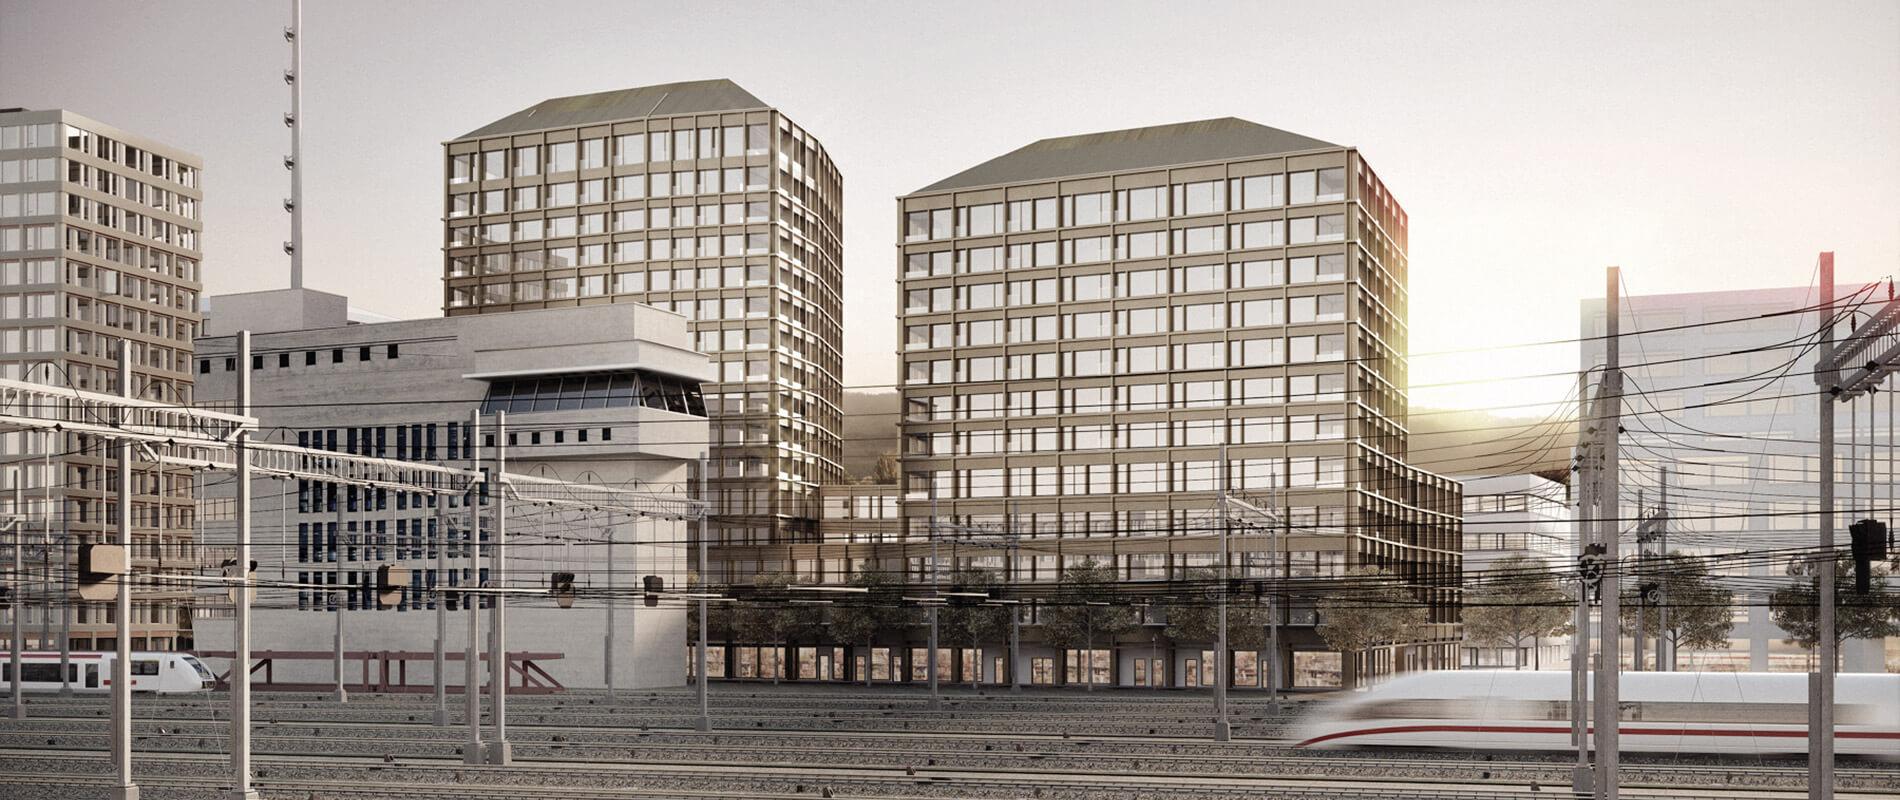 Europaallee Baufeld G | Eigentumswohnungen |Käuferberatung |Referenz | Ettinger Partner